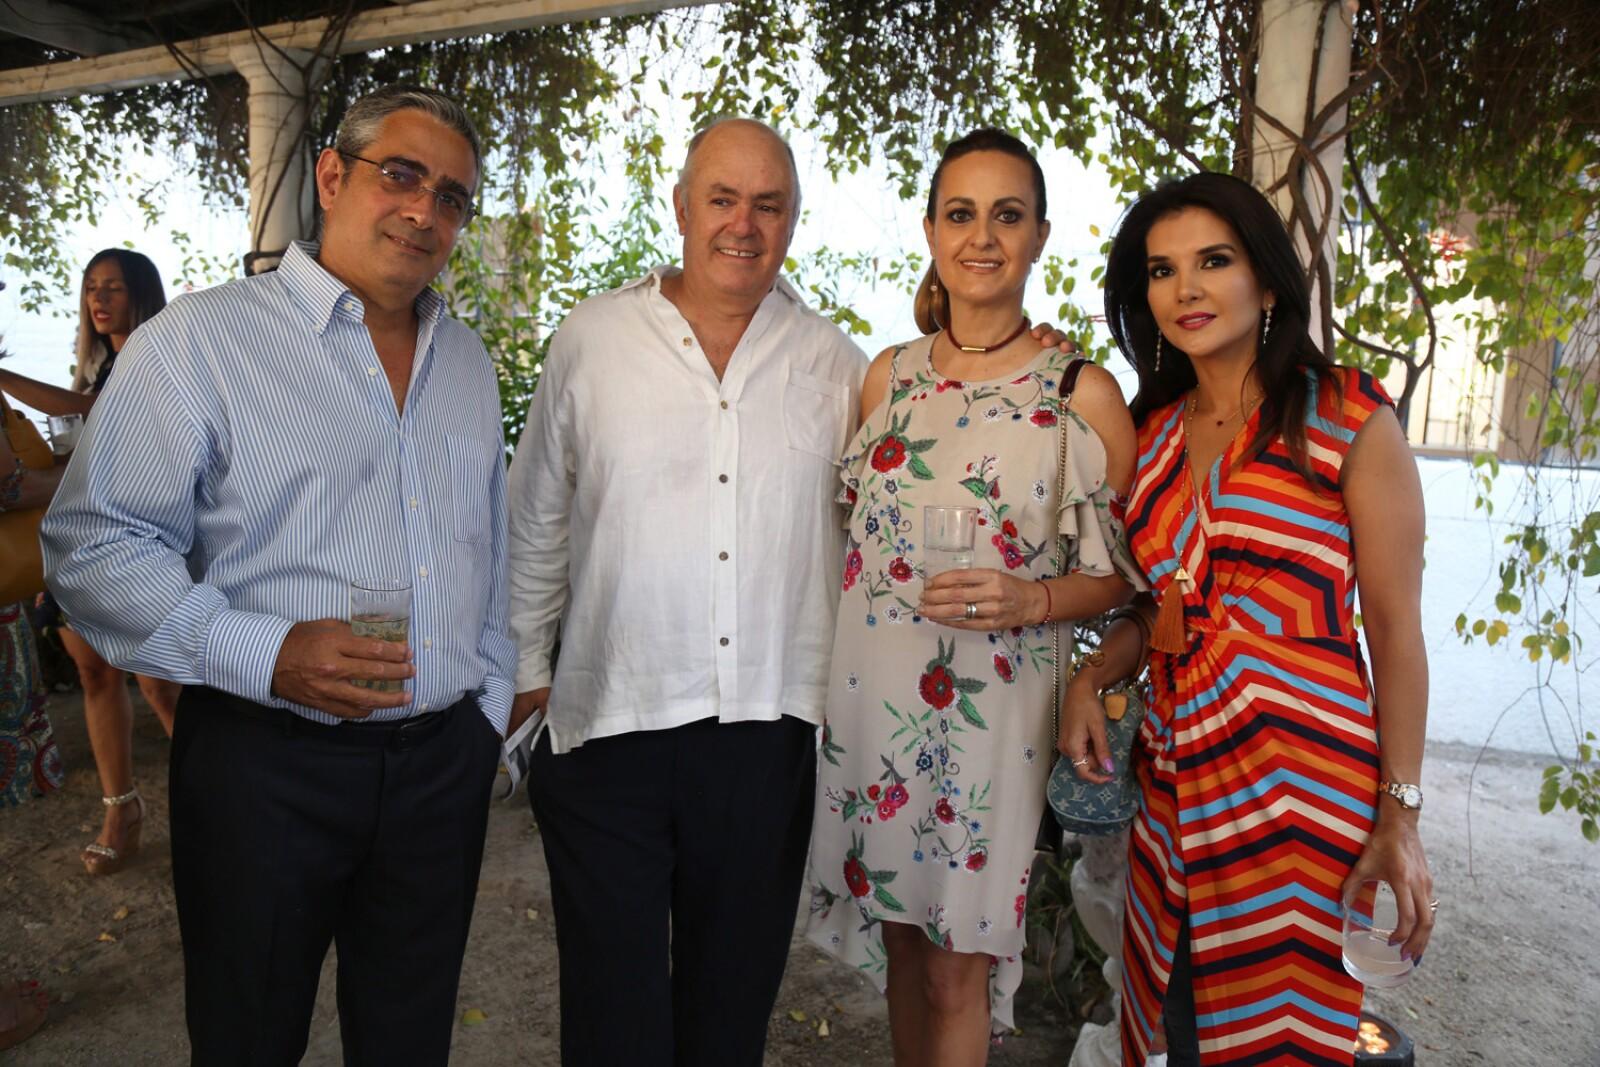 Enrique Limas, Javier Manterola, Maria Luisa Reynoso, Marita Hinojosa.jpg